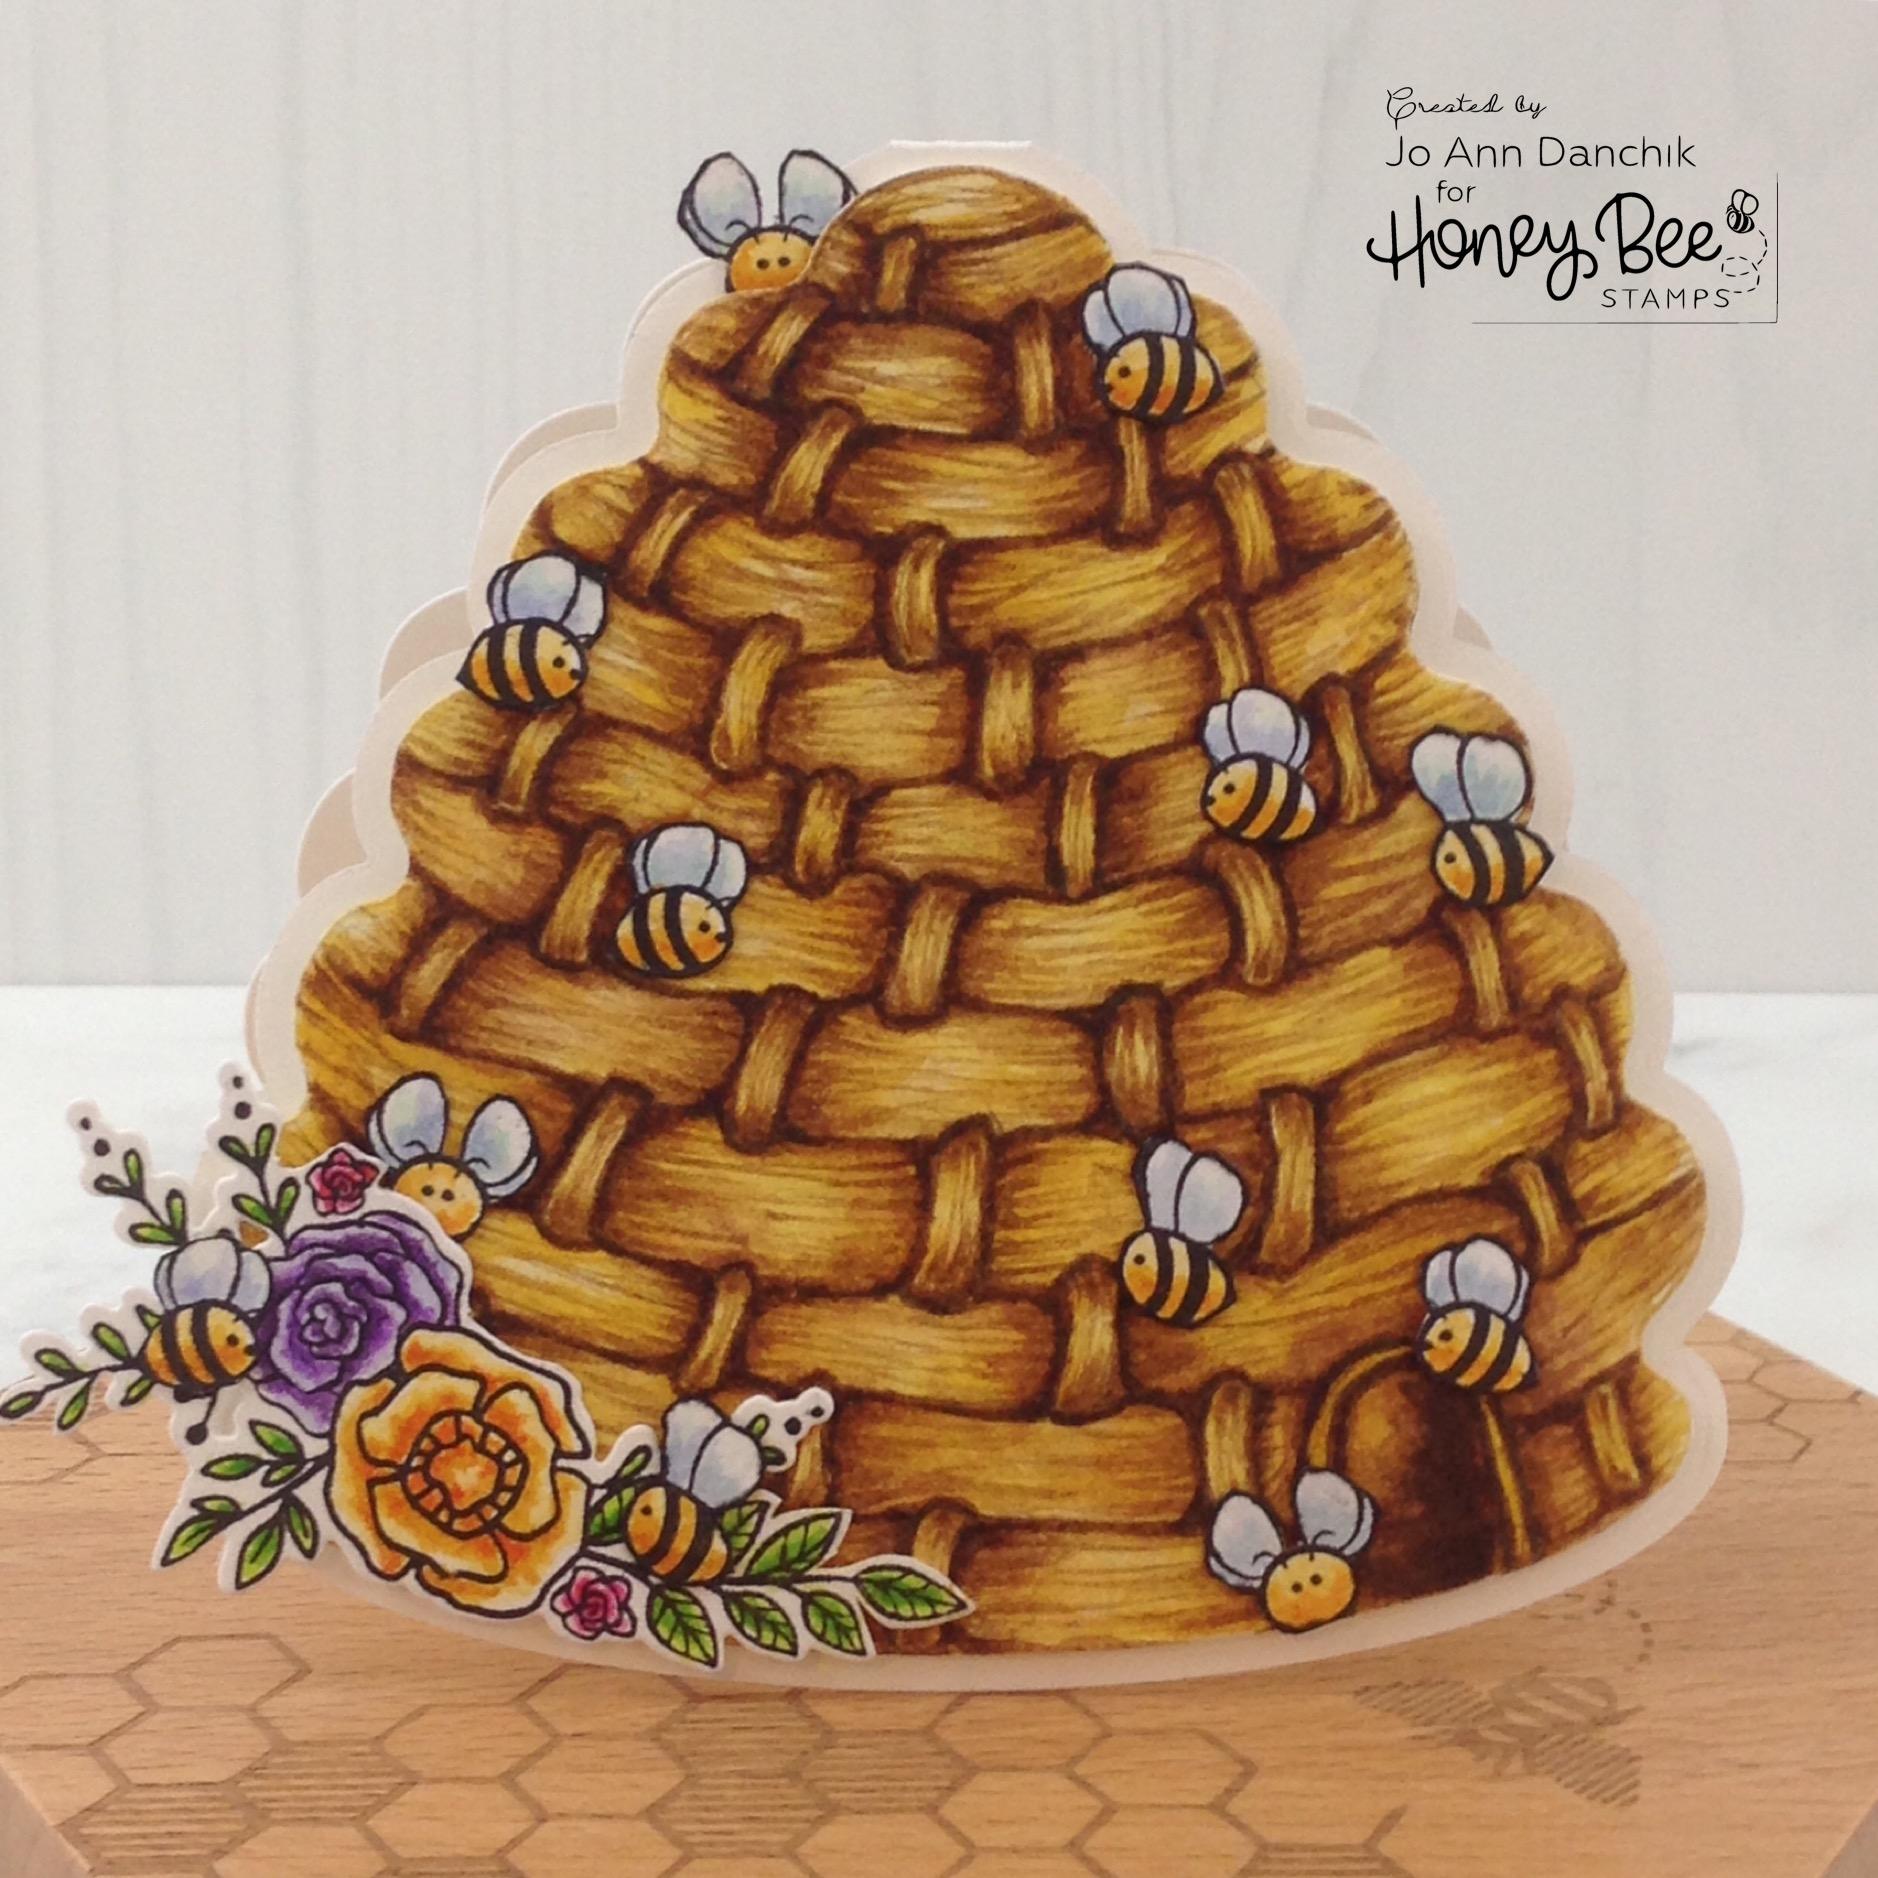 Creative Sundays With Jo Ann: Bee Strong!